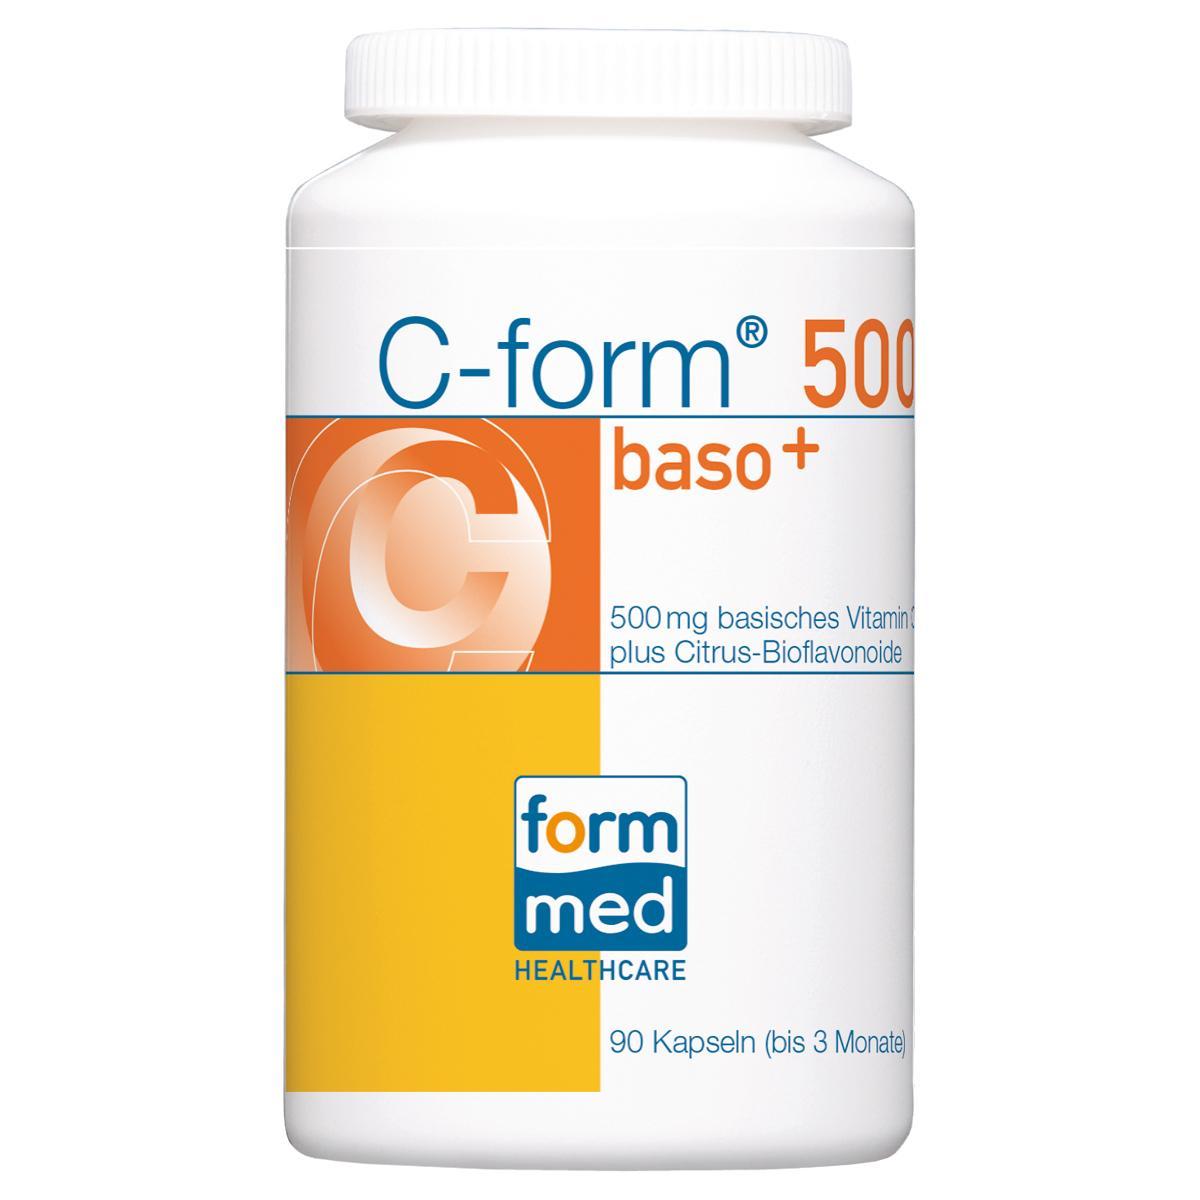 C-form® 500 baso+ | C | Präparate A-Z | FormMed HealthCare AG ...